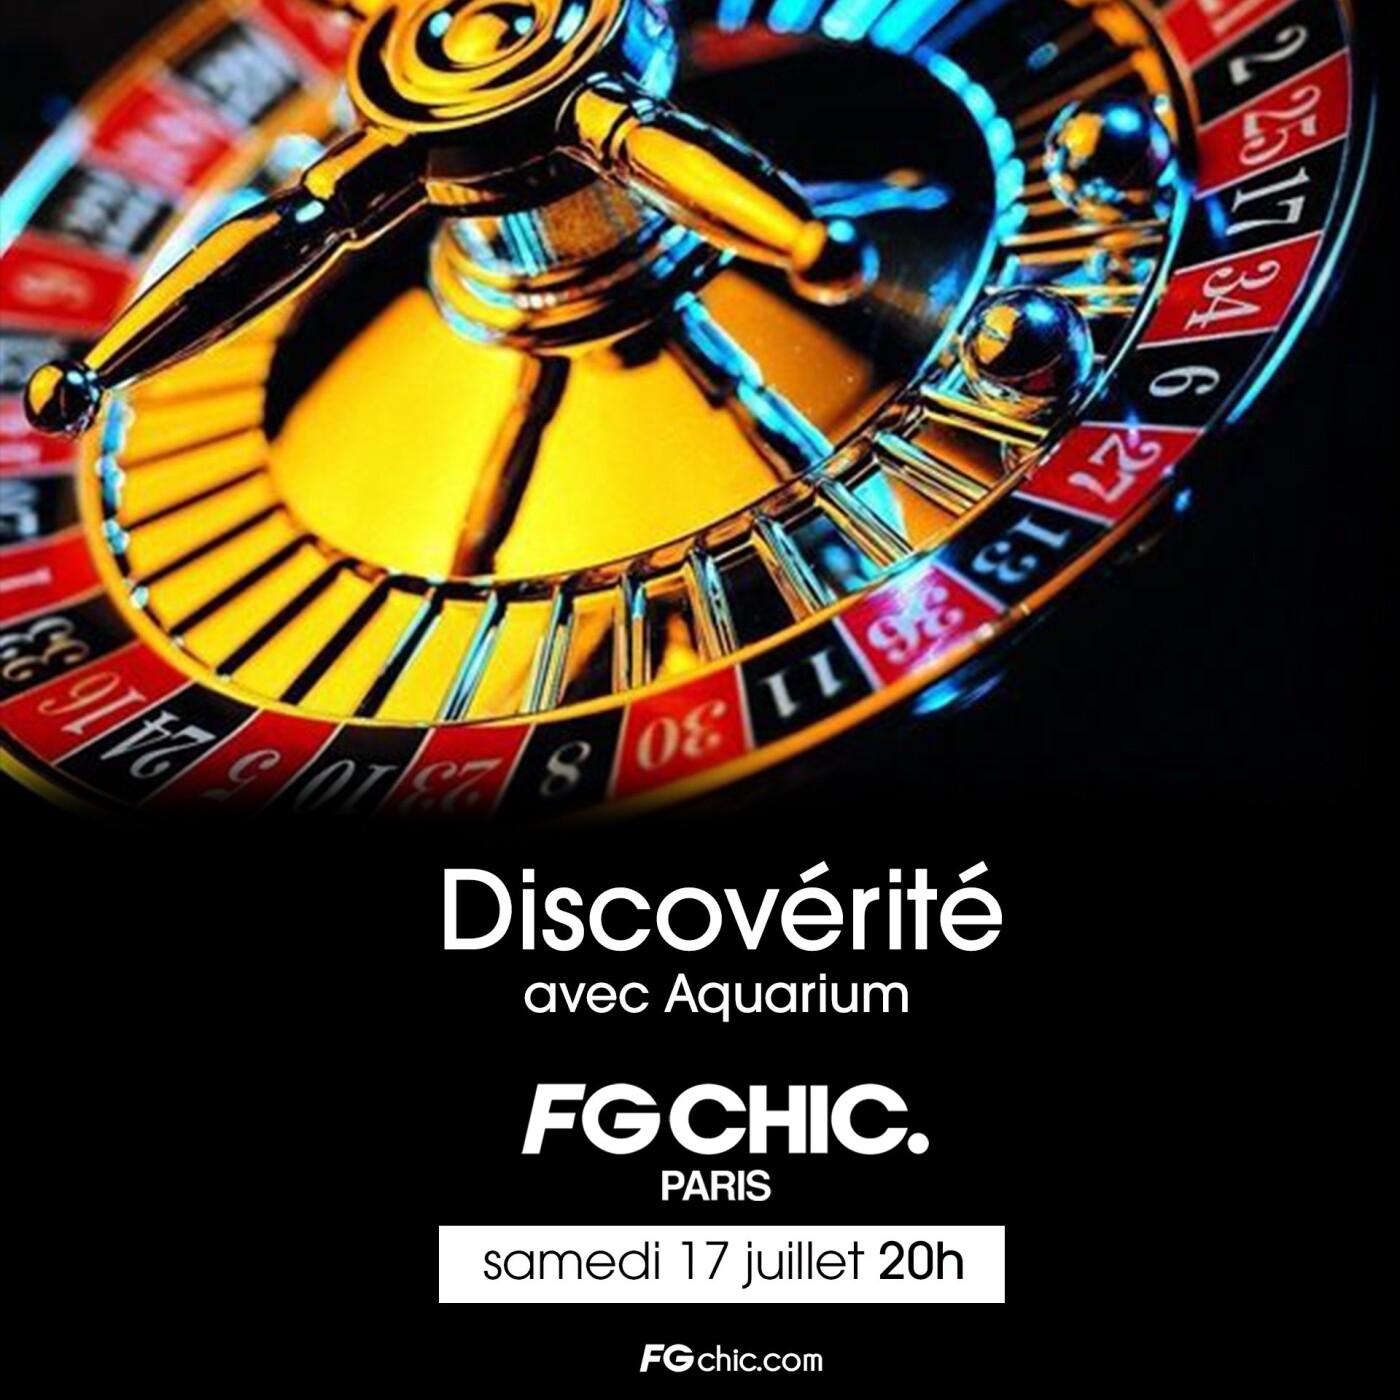 FG CHIC MIX : DISCOVERITE BY L'AQUARIUM